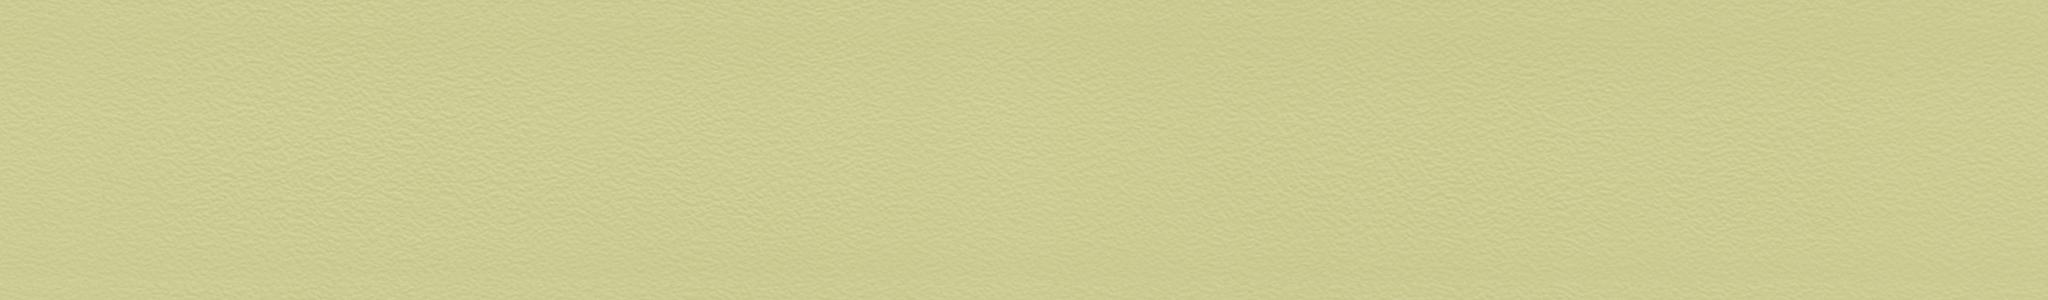 HU 169500 ABS hrana zelená Carambola perla XG